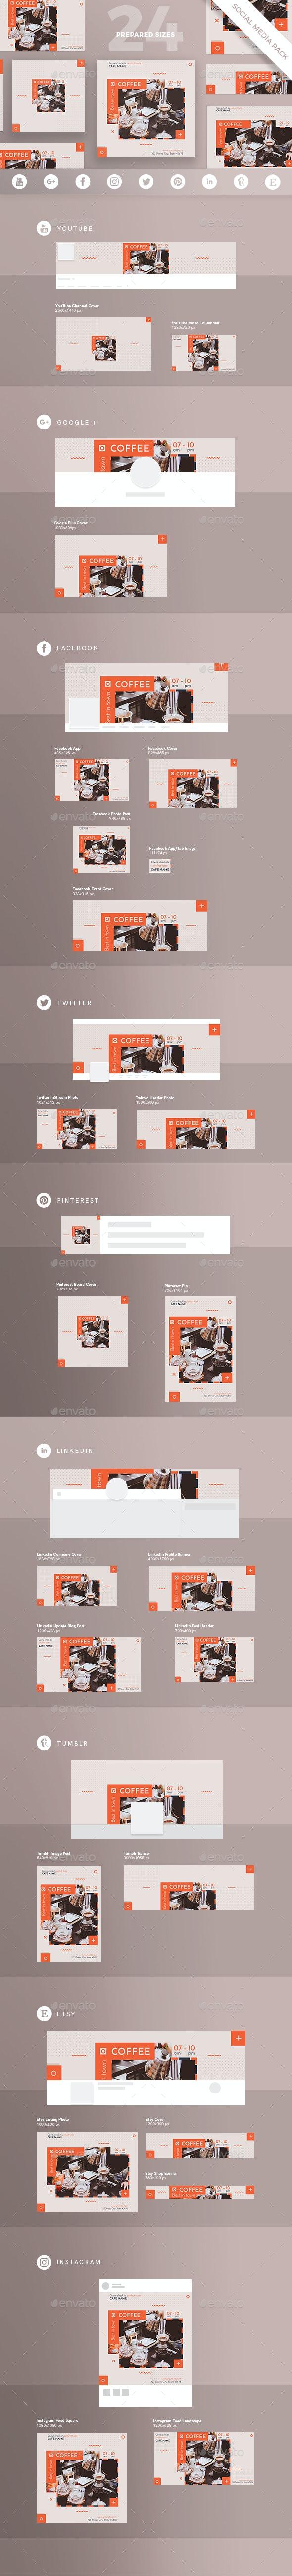 Coffee Shop Social Media Pack - Miscellaneous Social Media